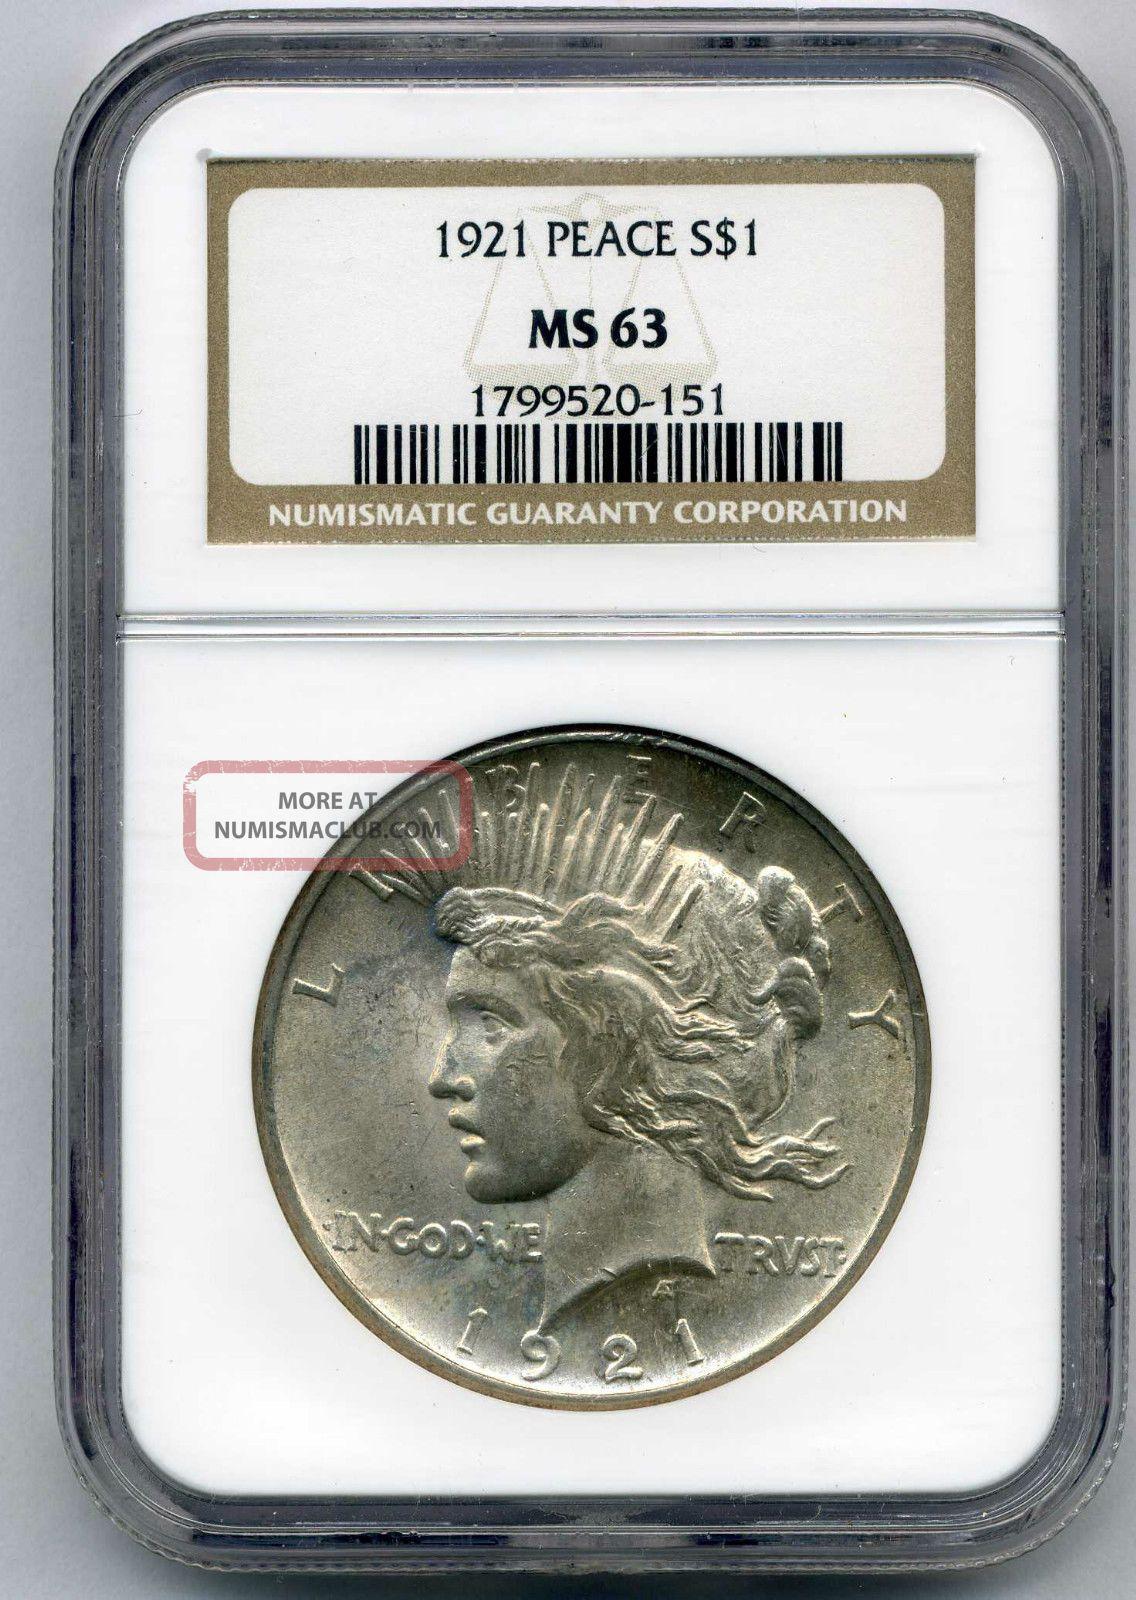 1921 Peace Dollar Ngc Ms - 63 Dollars photo